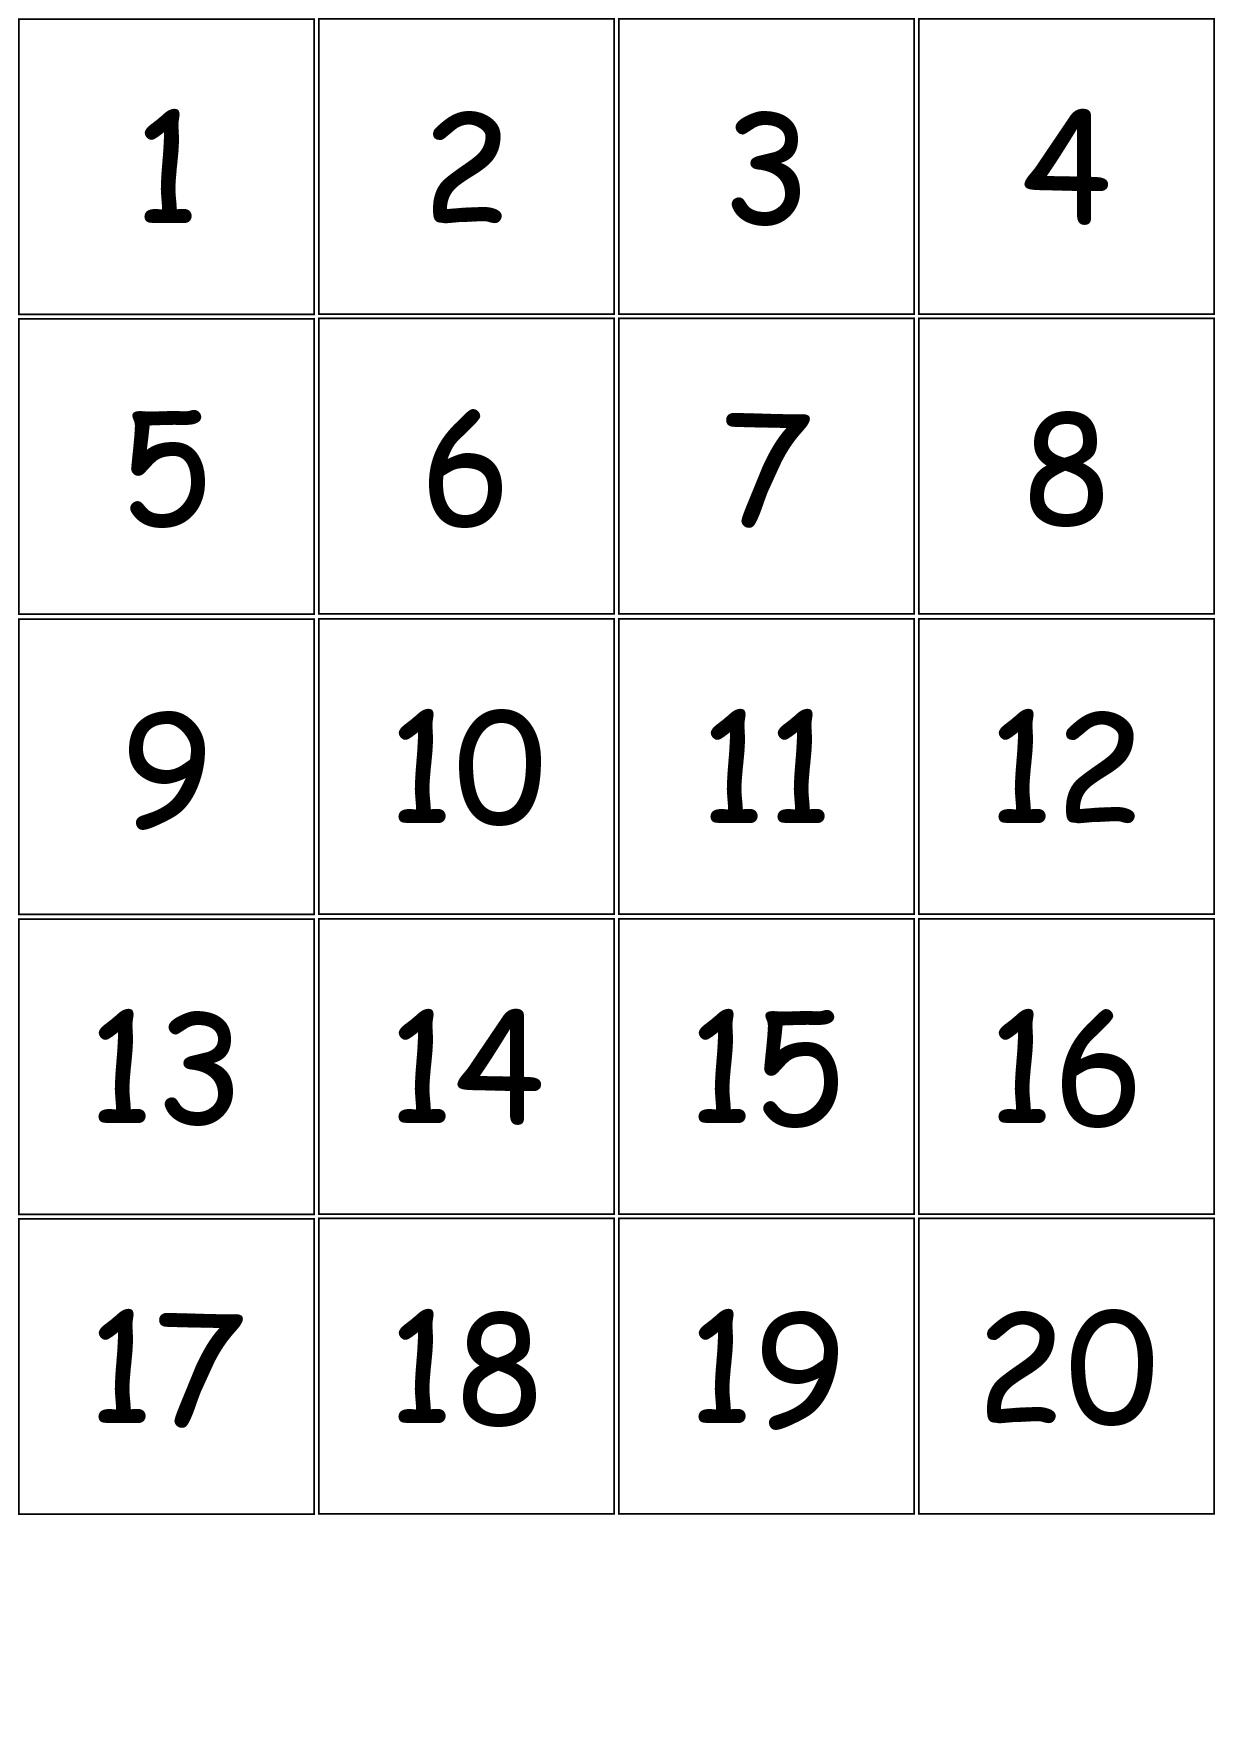 Number+Cards+1 20 | Printable Numbers, Number Cards Print Numbers 1 To 31